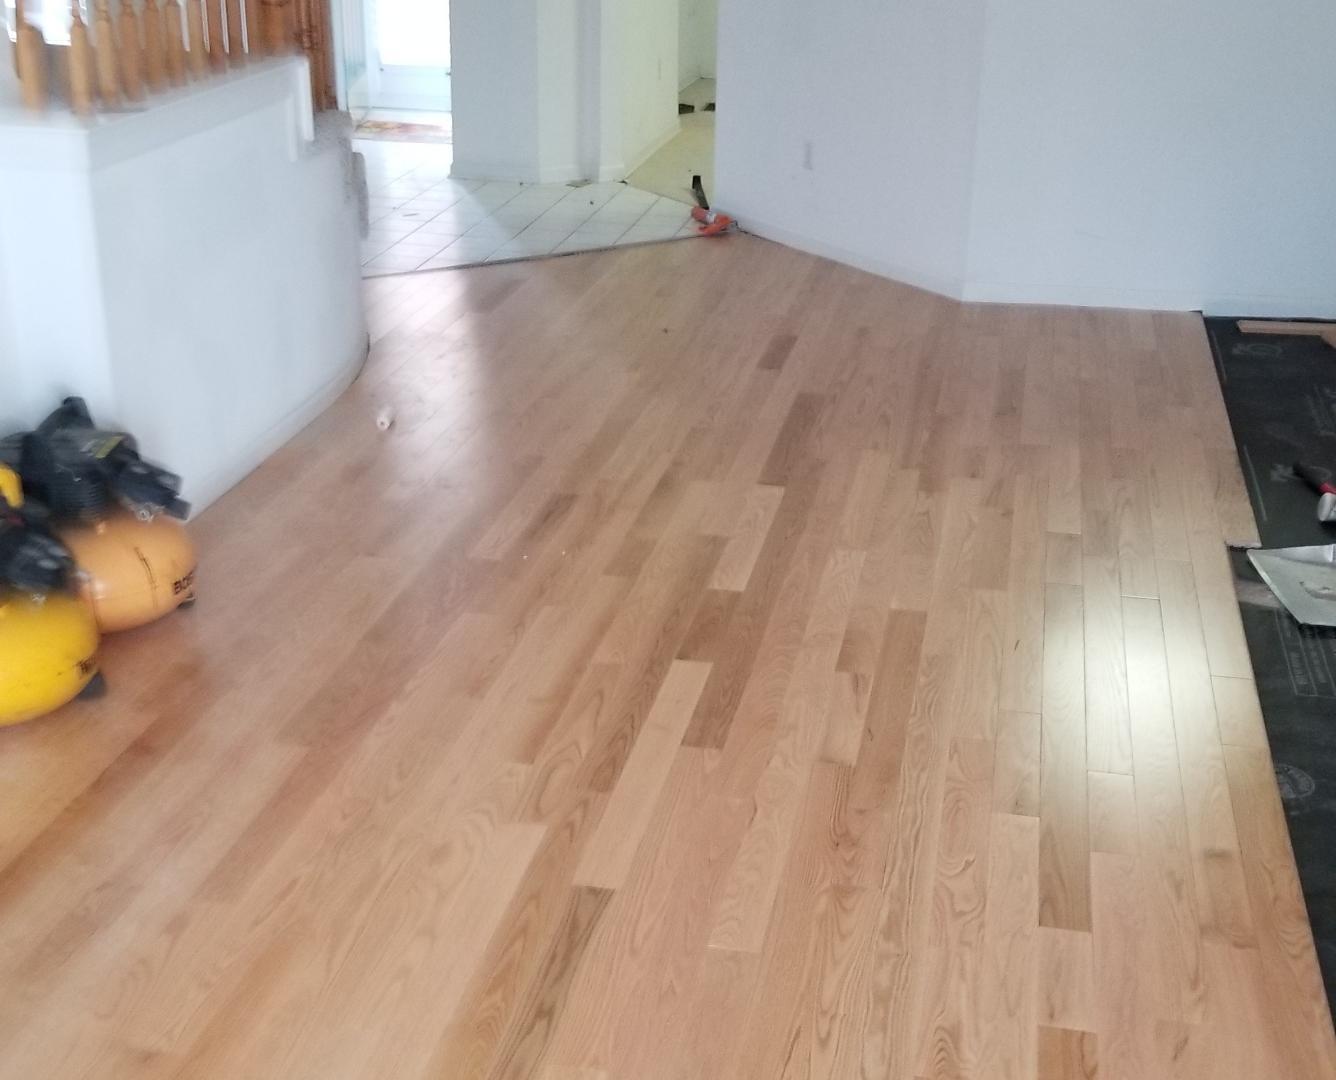 Cramer Hardwood Floors image 7